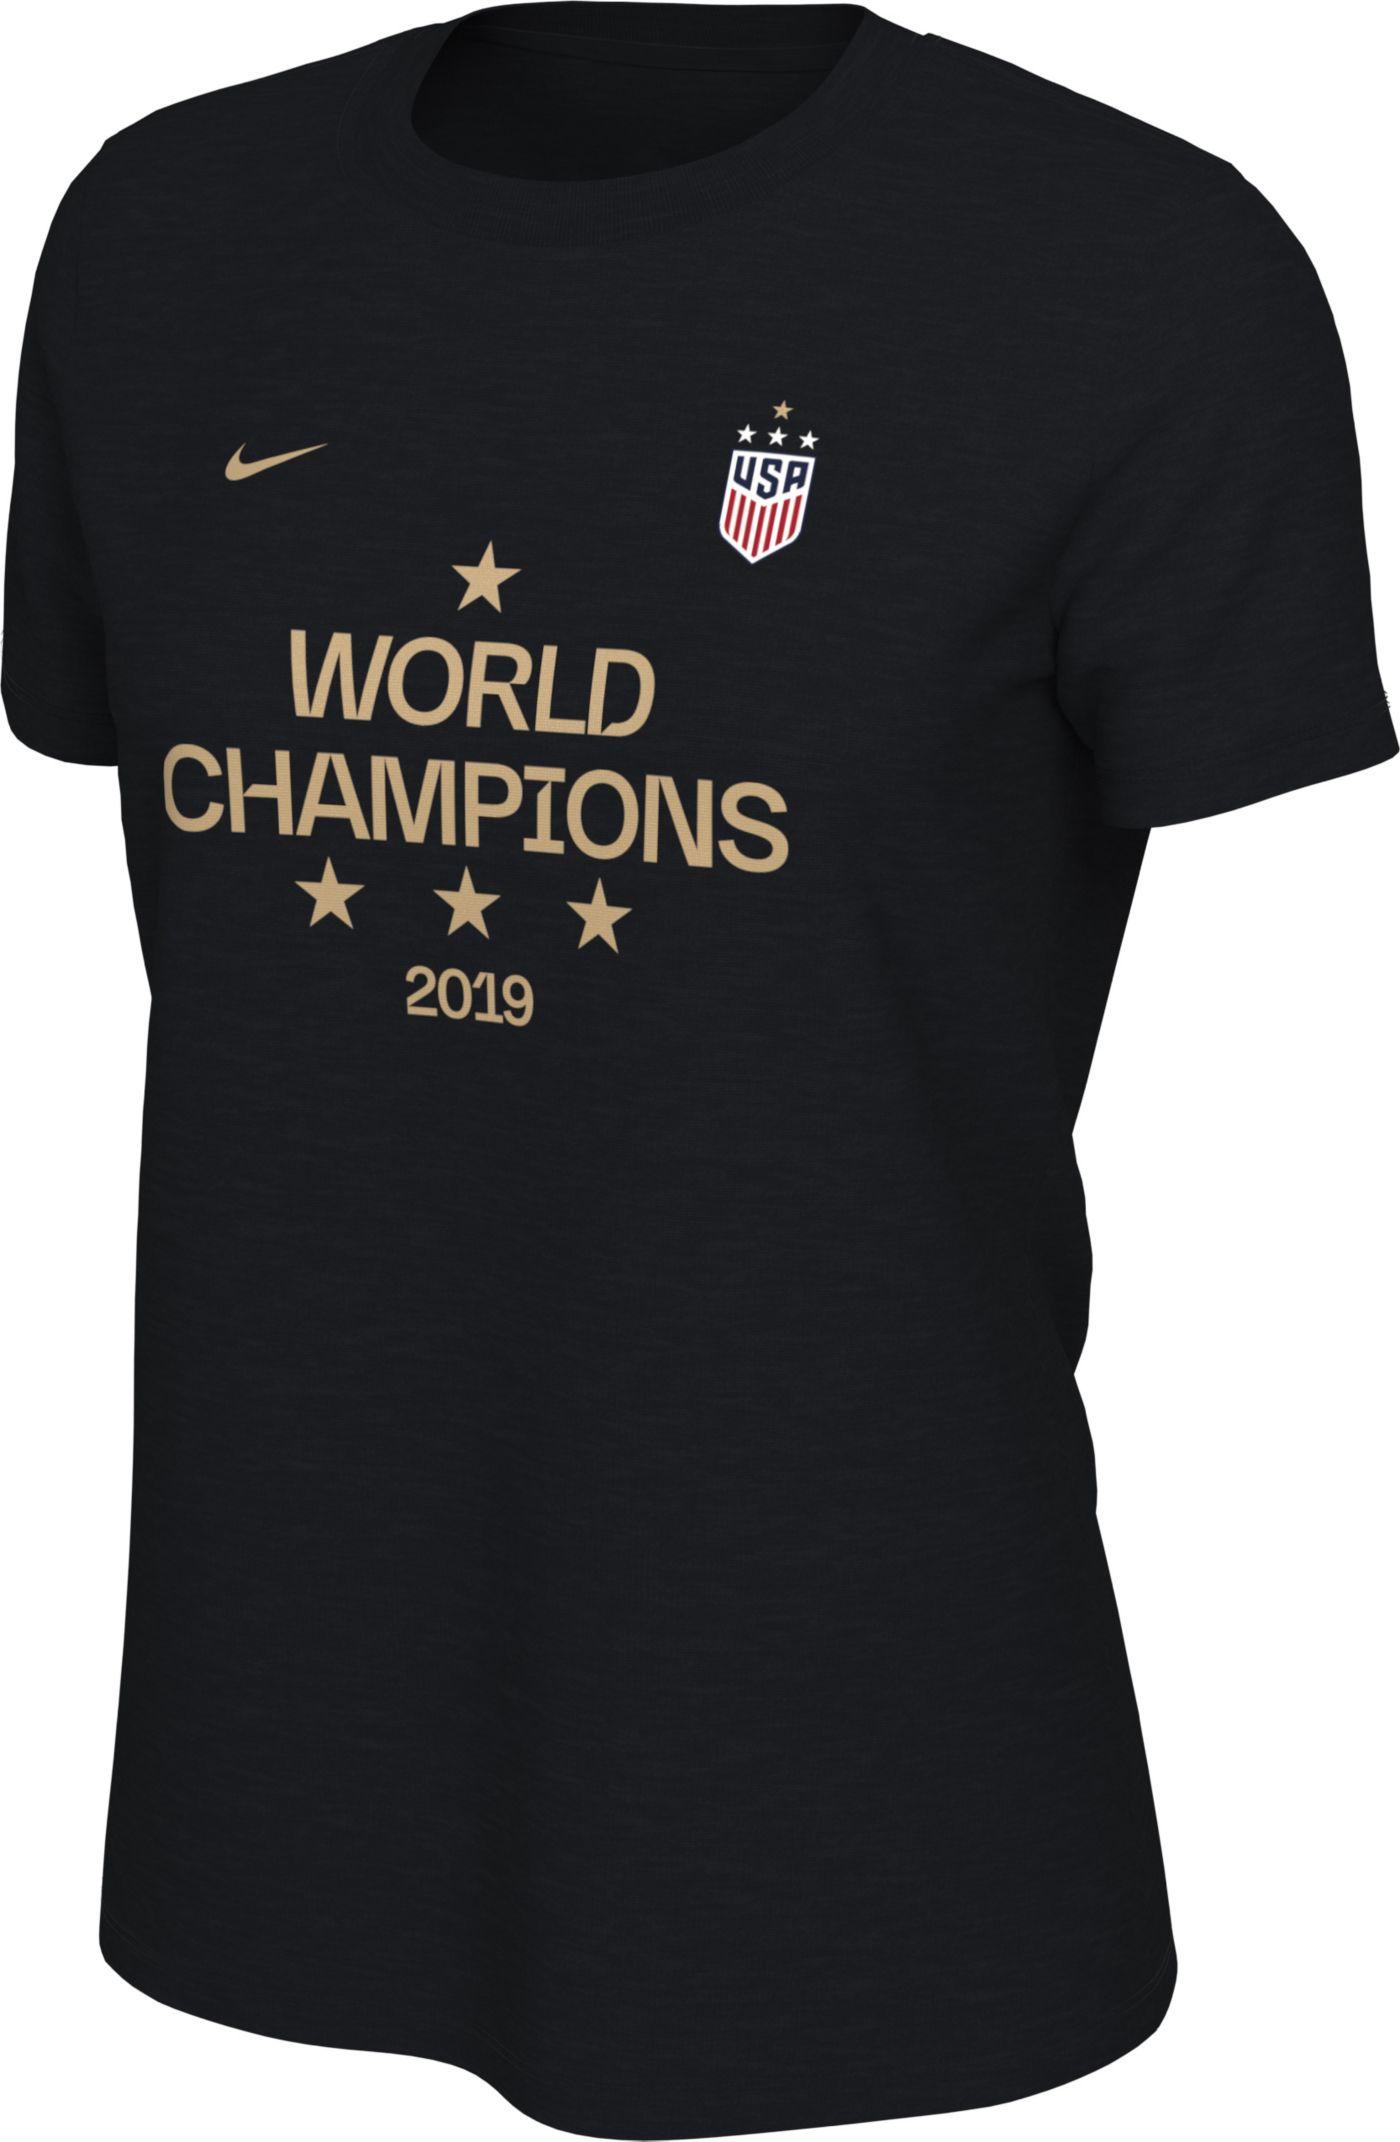 Nike Women's 2019 FIFA Women's World Cup Champions USA Soccer Black T-Shirt